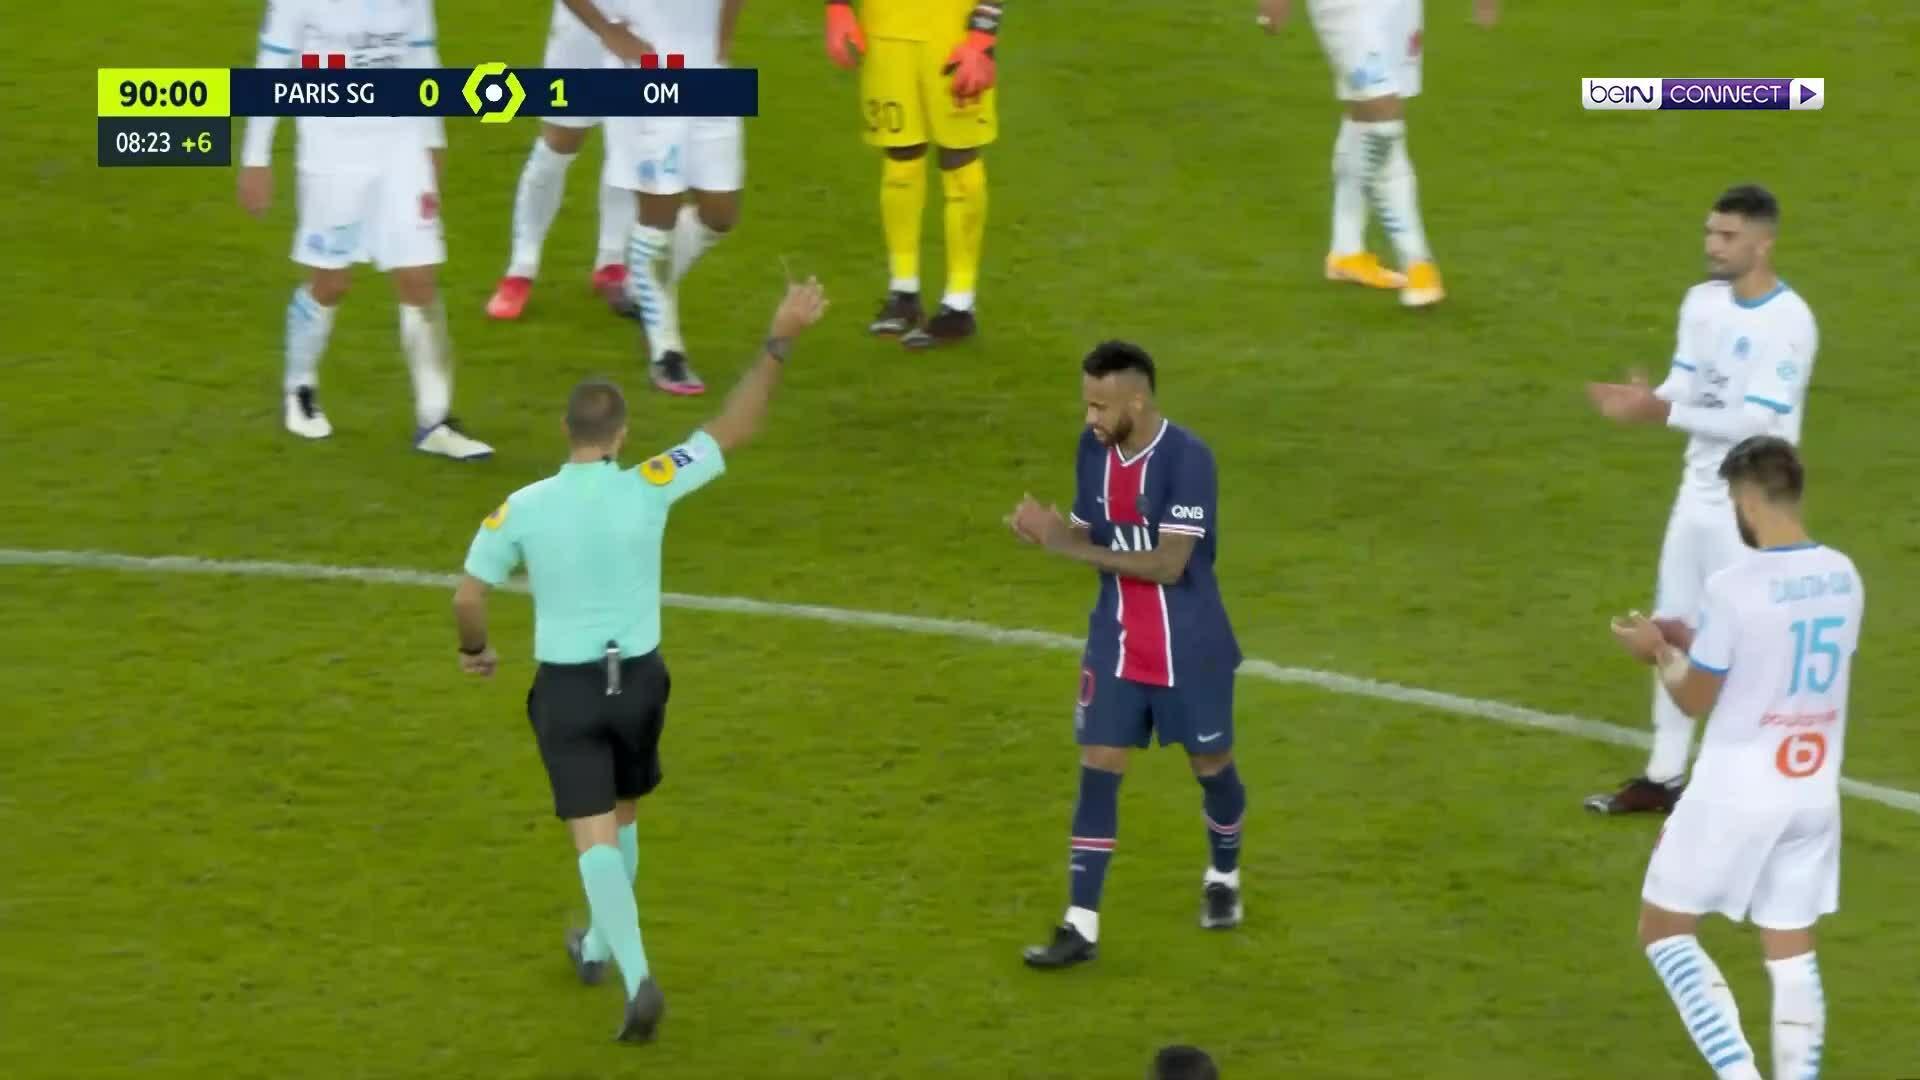 PSG 0-1 Marseille